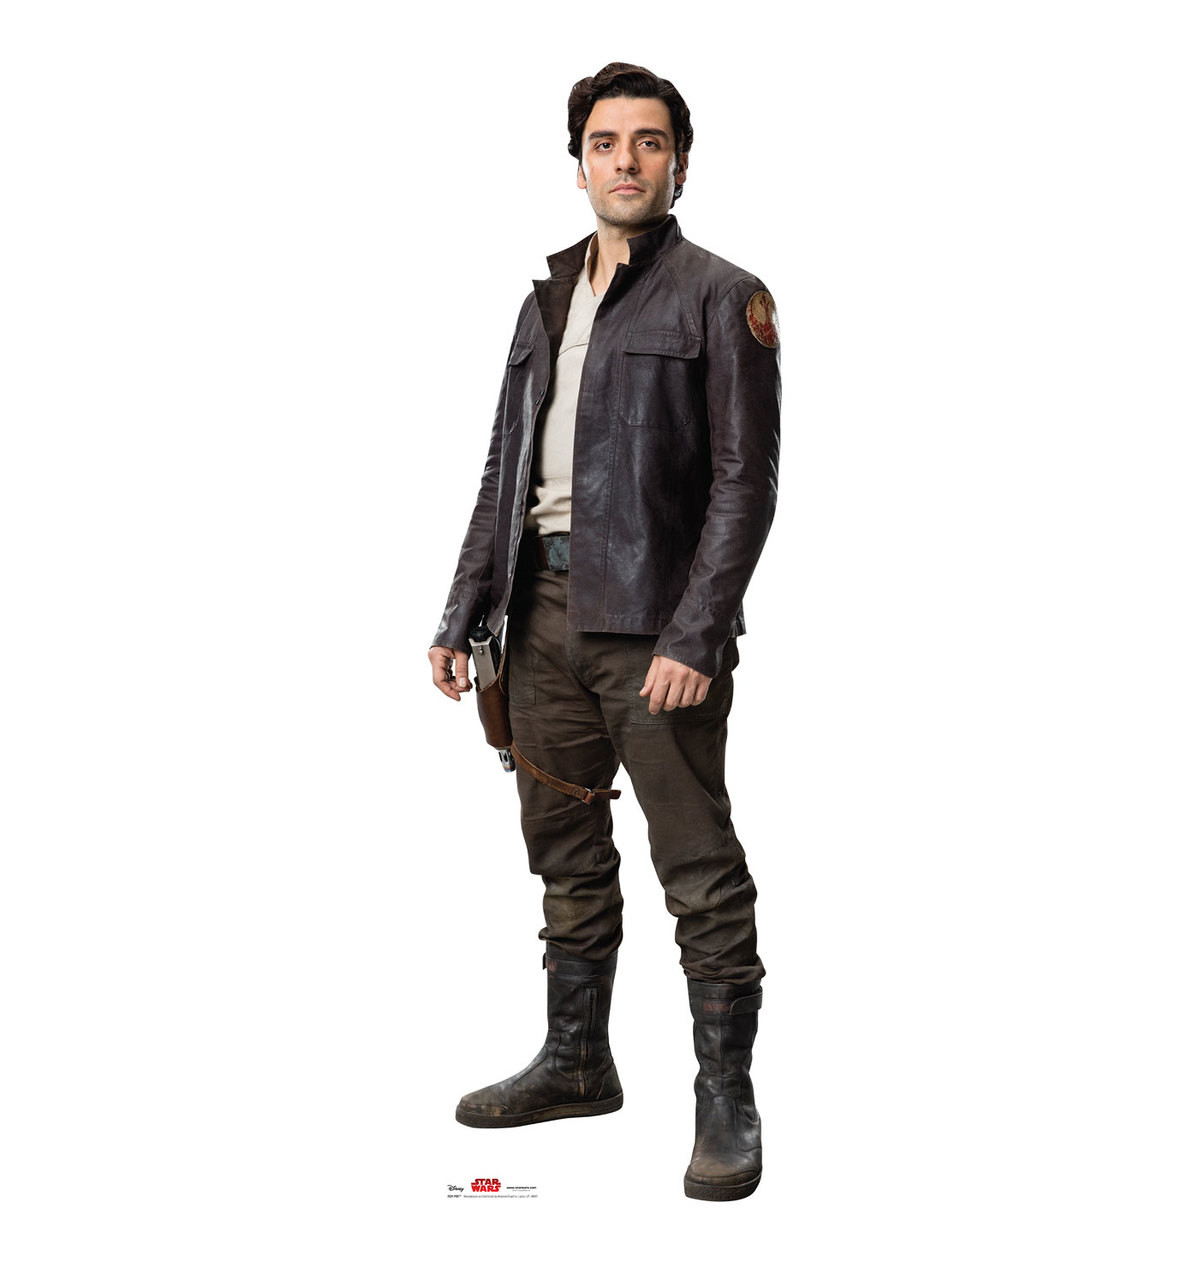 Poe - Star Wars: The Last Jedi Life-Size Cardboard Cutout 1